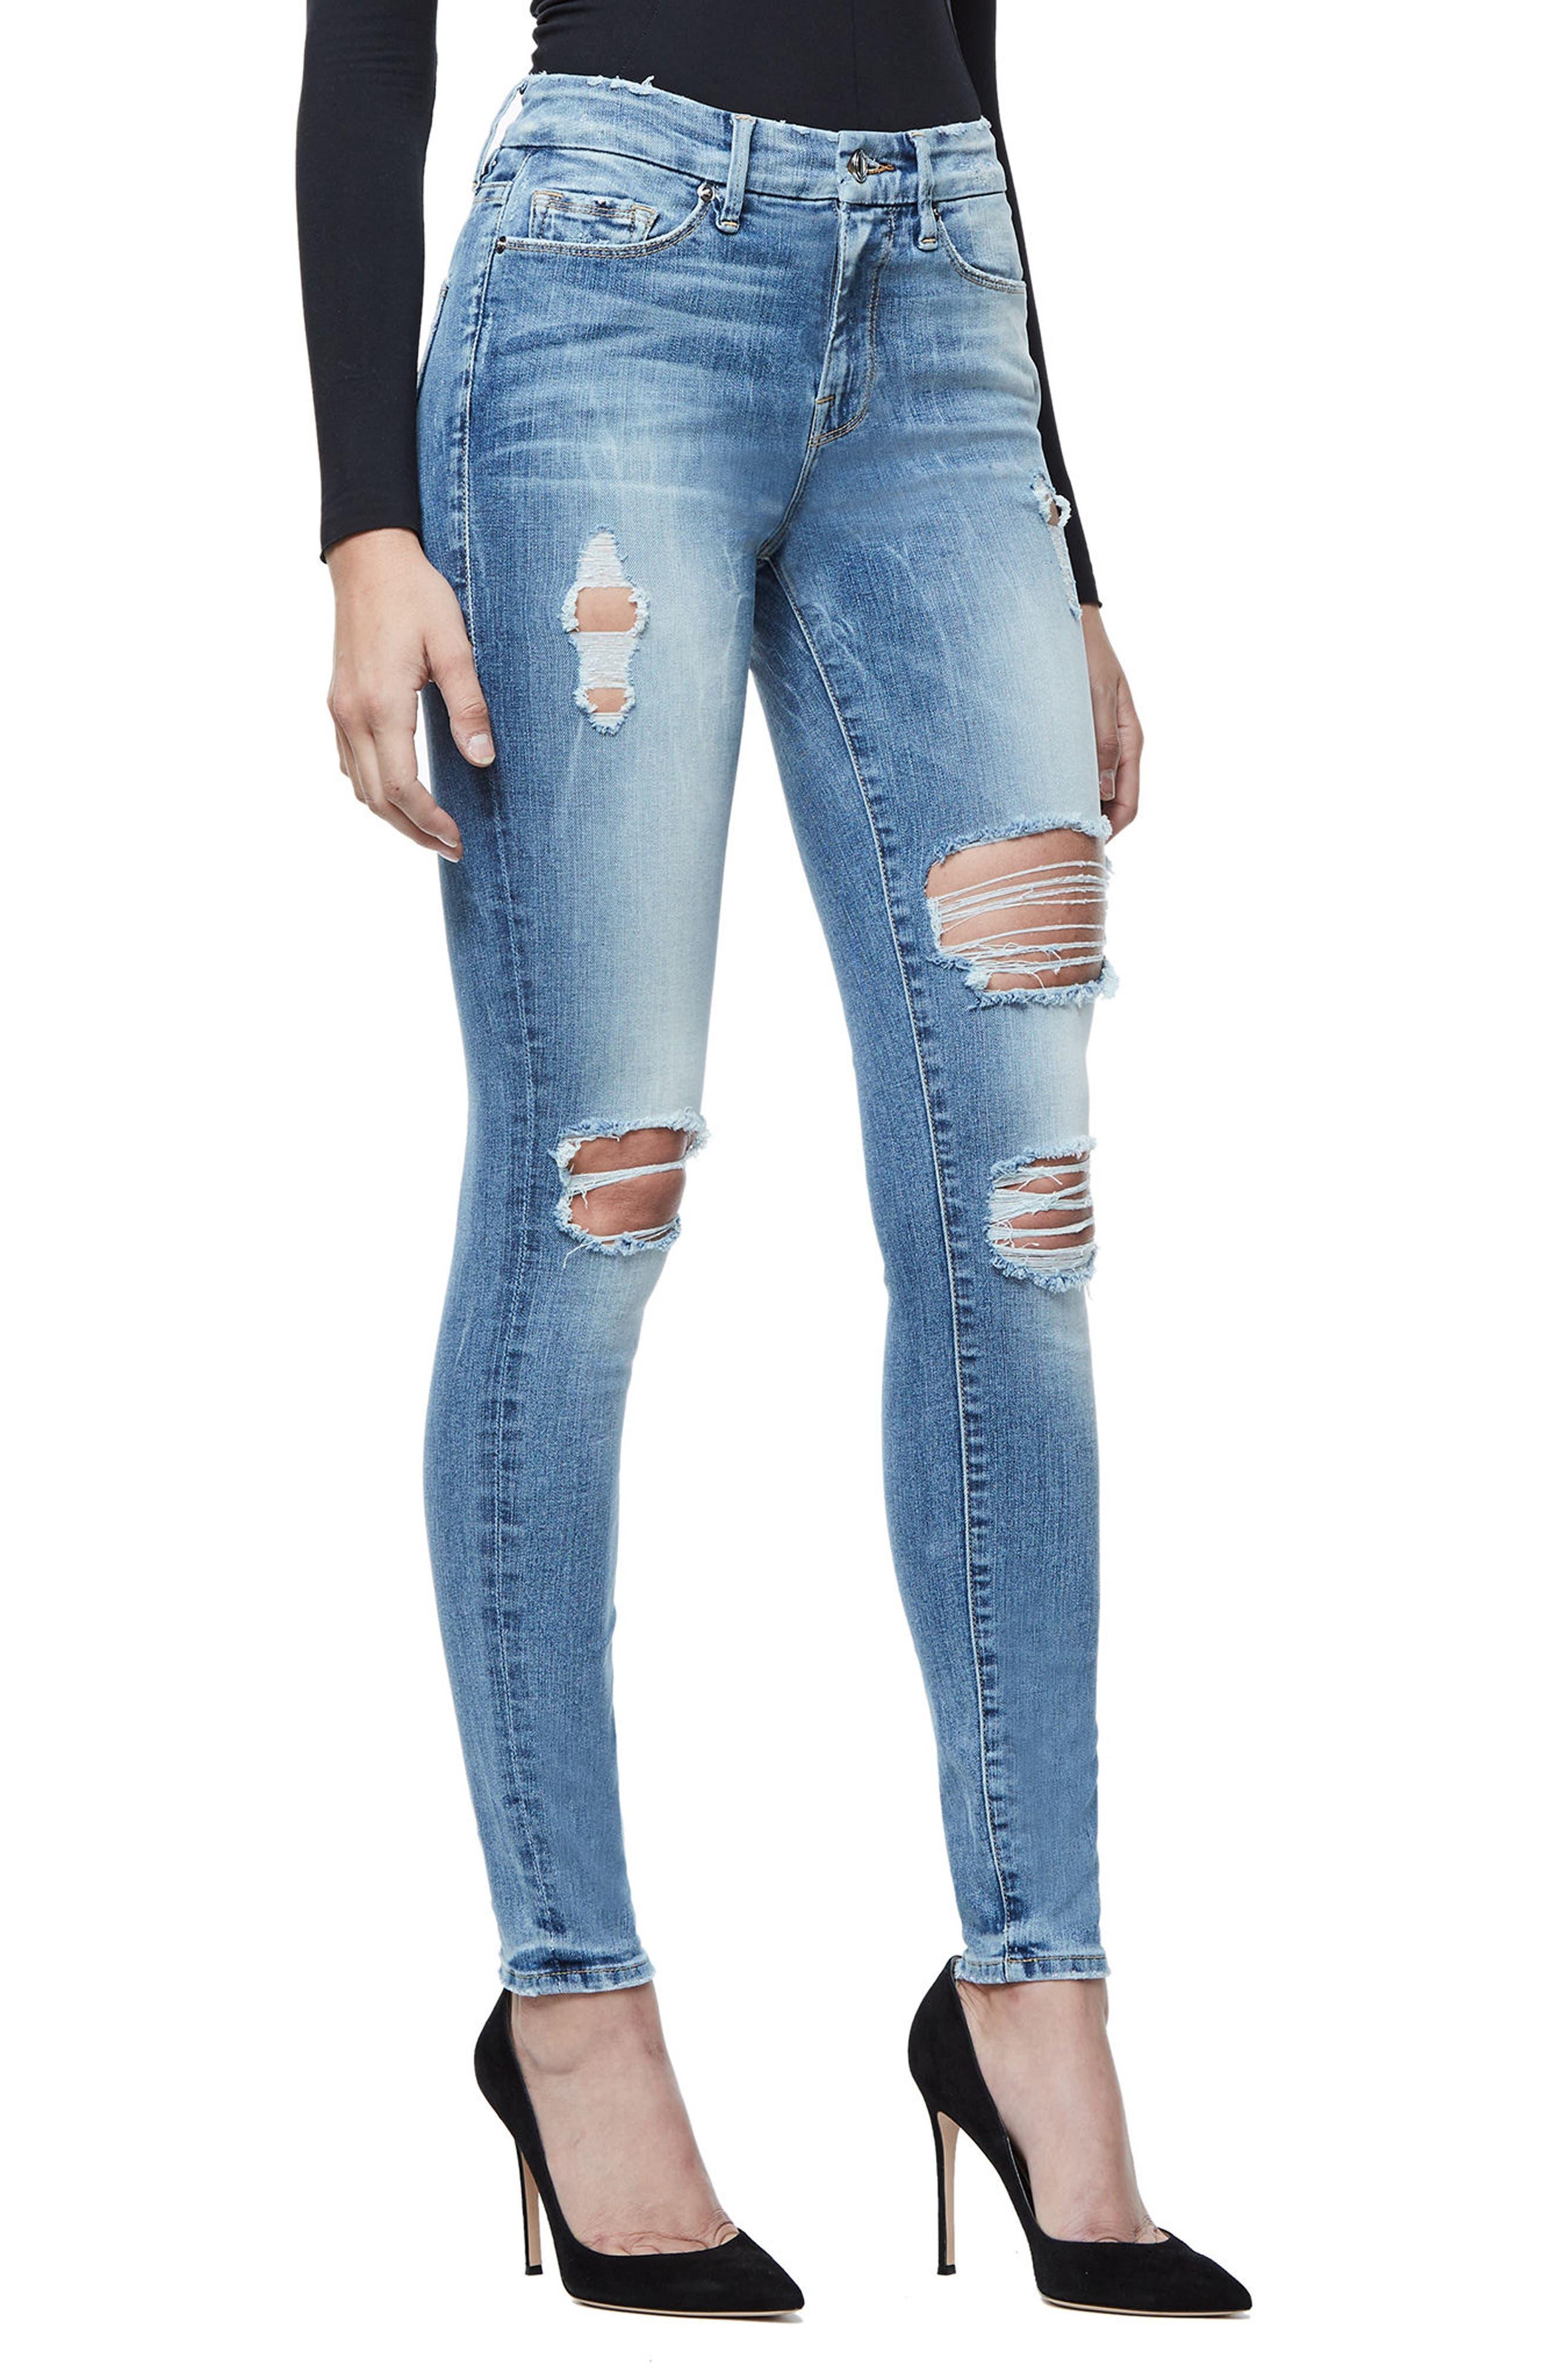 Alternate Image 3  - Good American Good Legs Ripped Skinny Jeans (Blue 068)